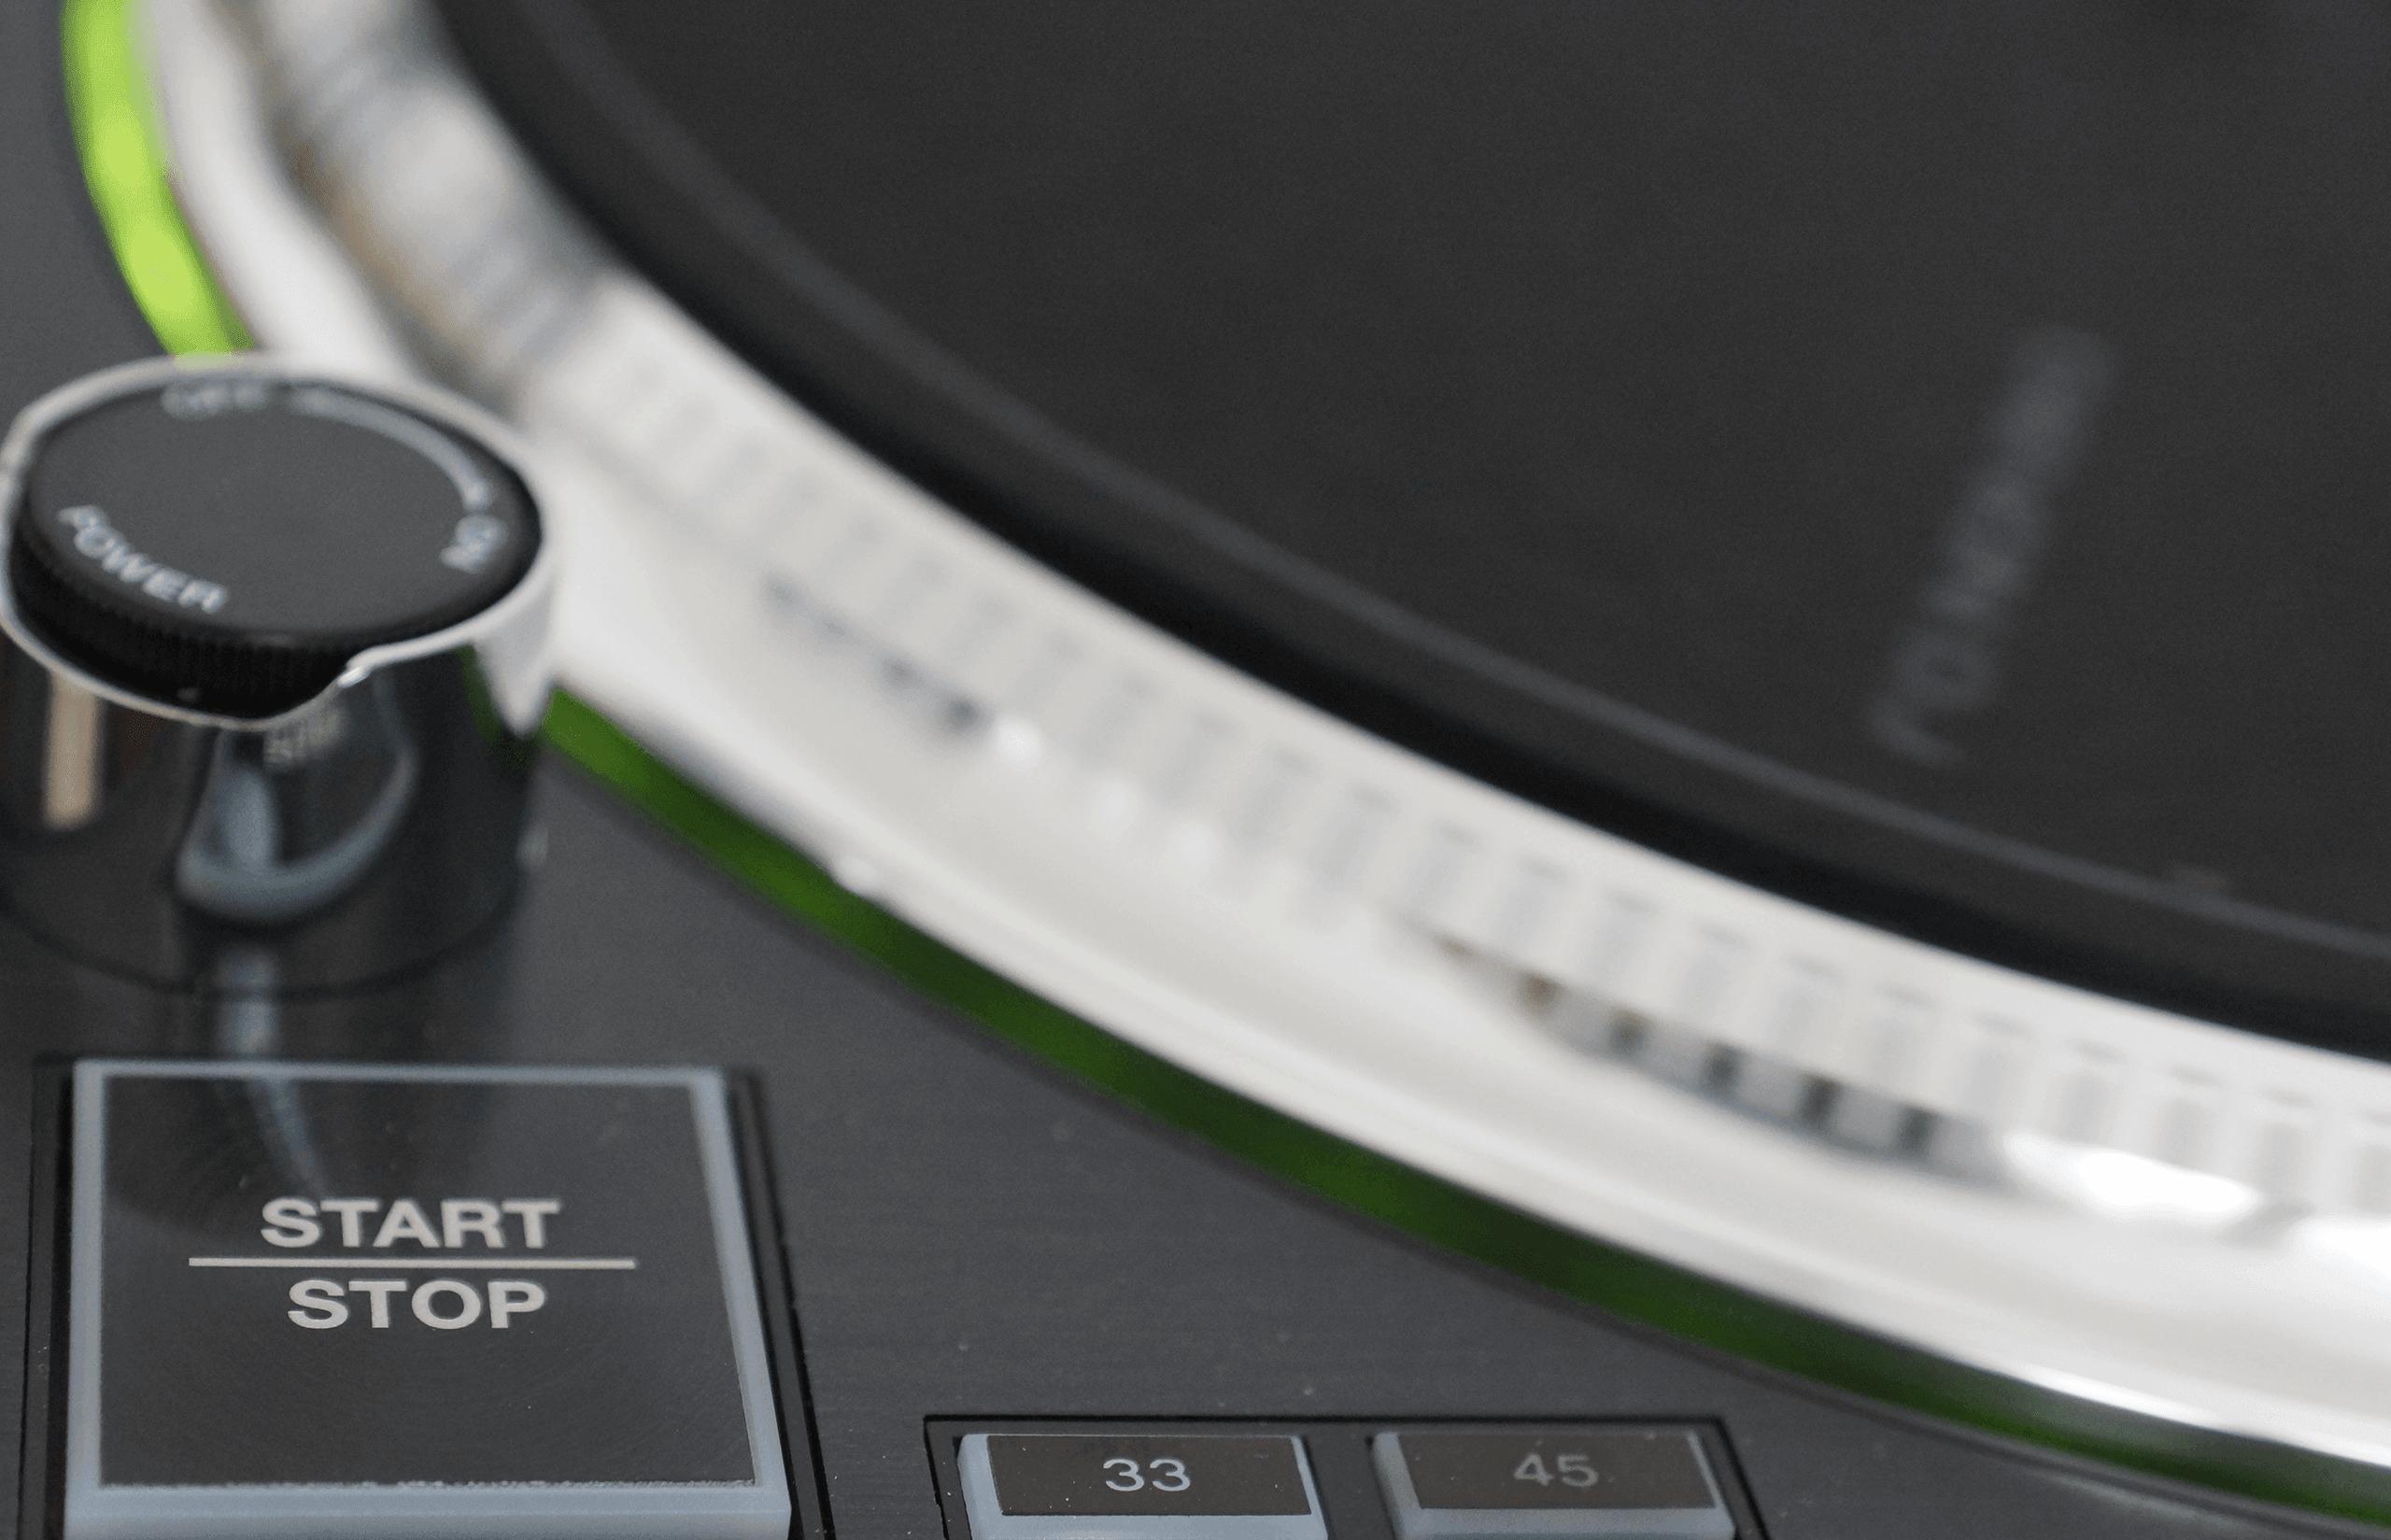 Sonos Vinyl: Denon DJ VL12 Prime Test 10 techboys.de • smarte News, auf den Punkt! Sonos Vinyl: Denon DJ VL12 Prime Test